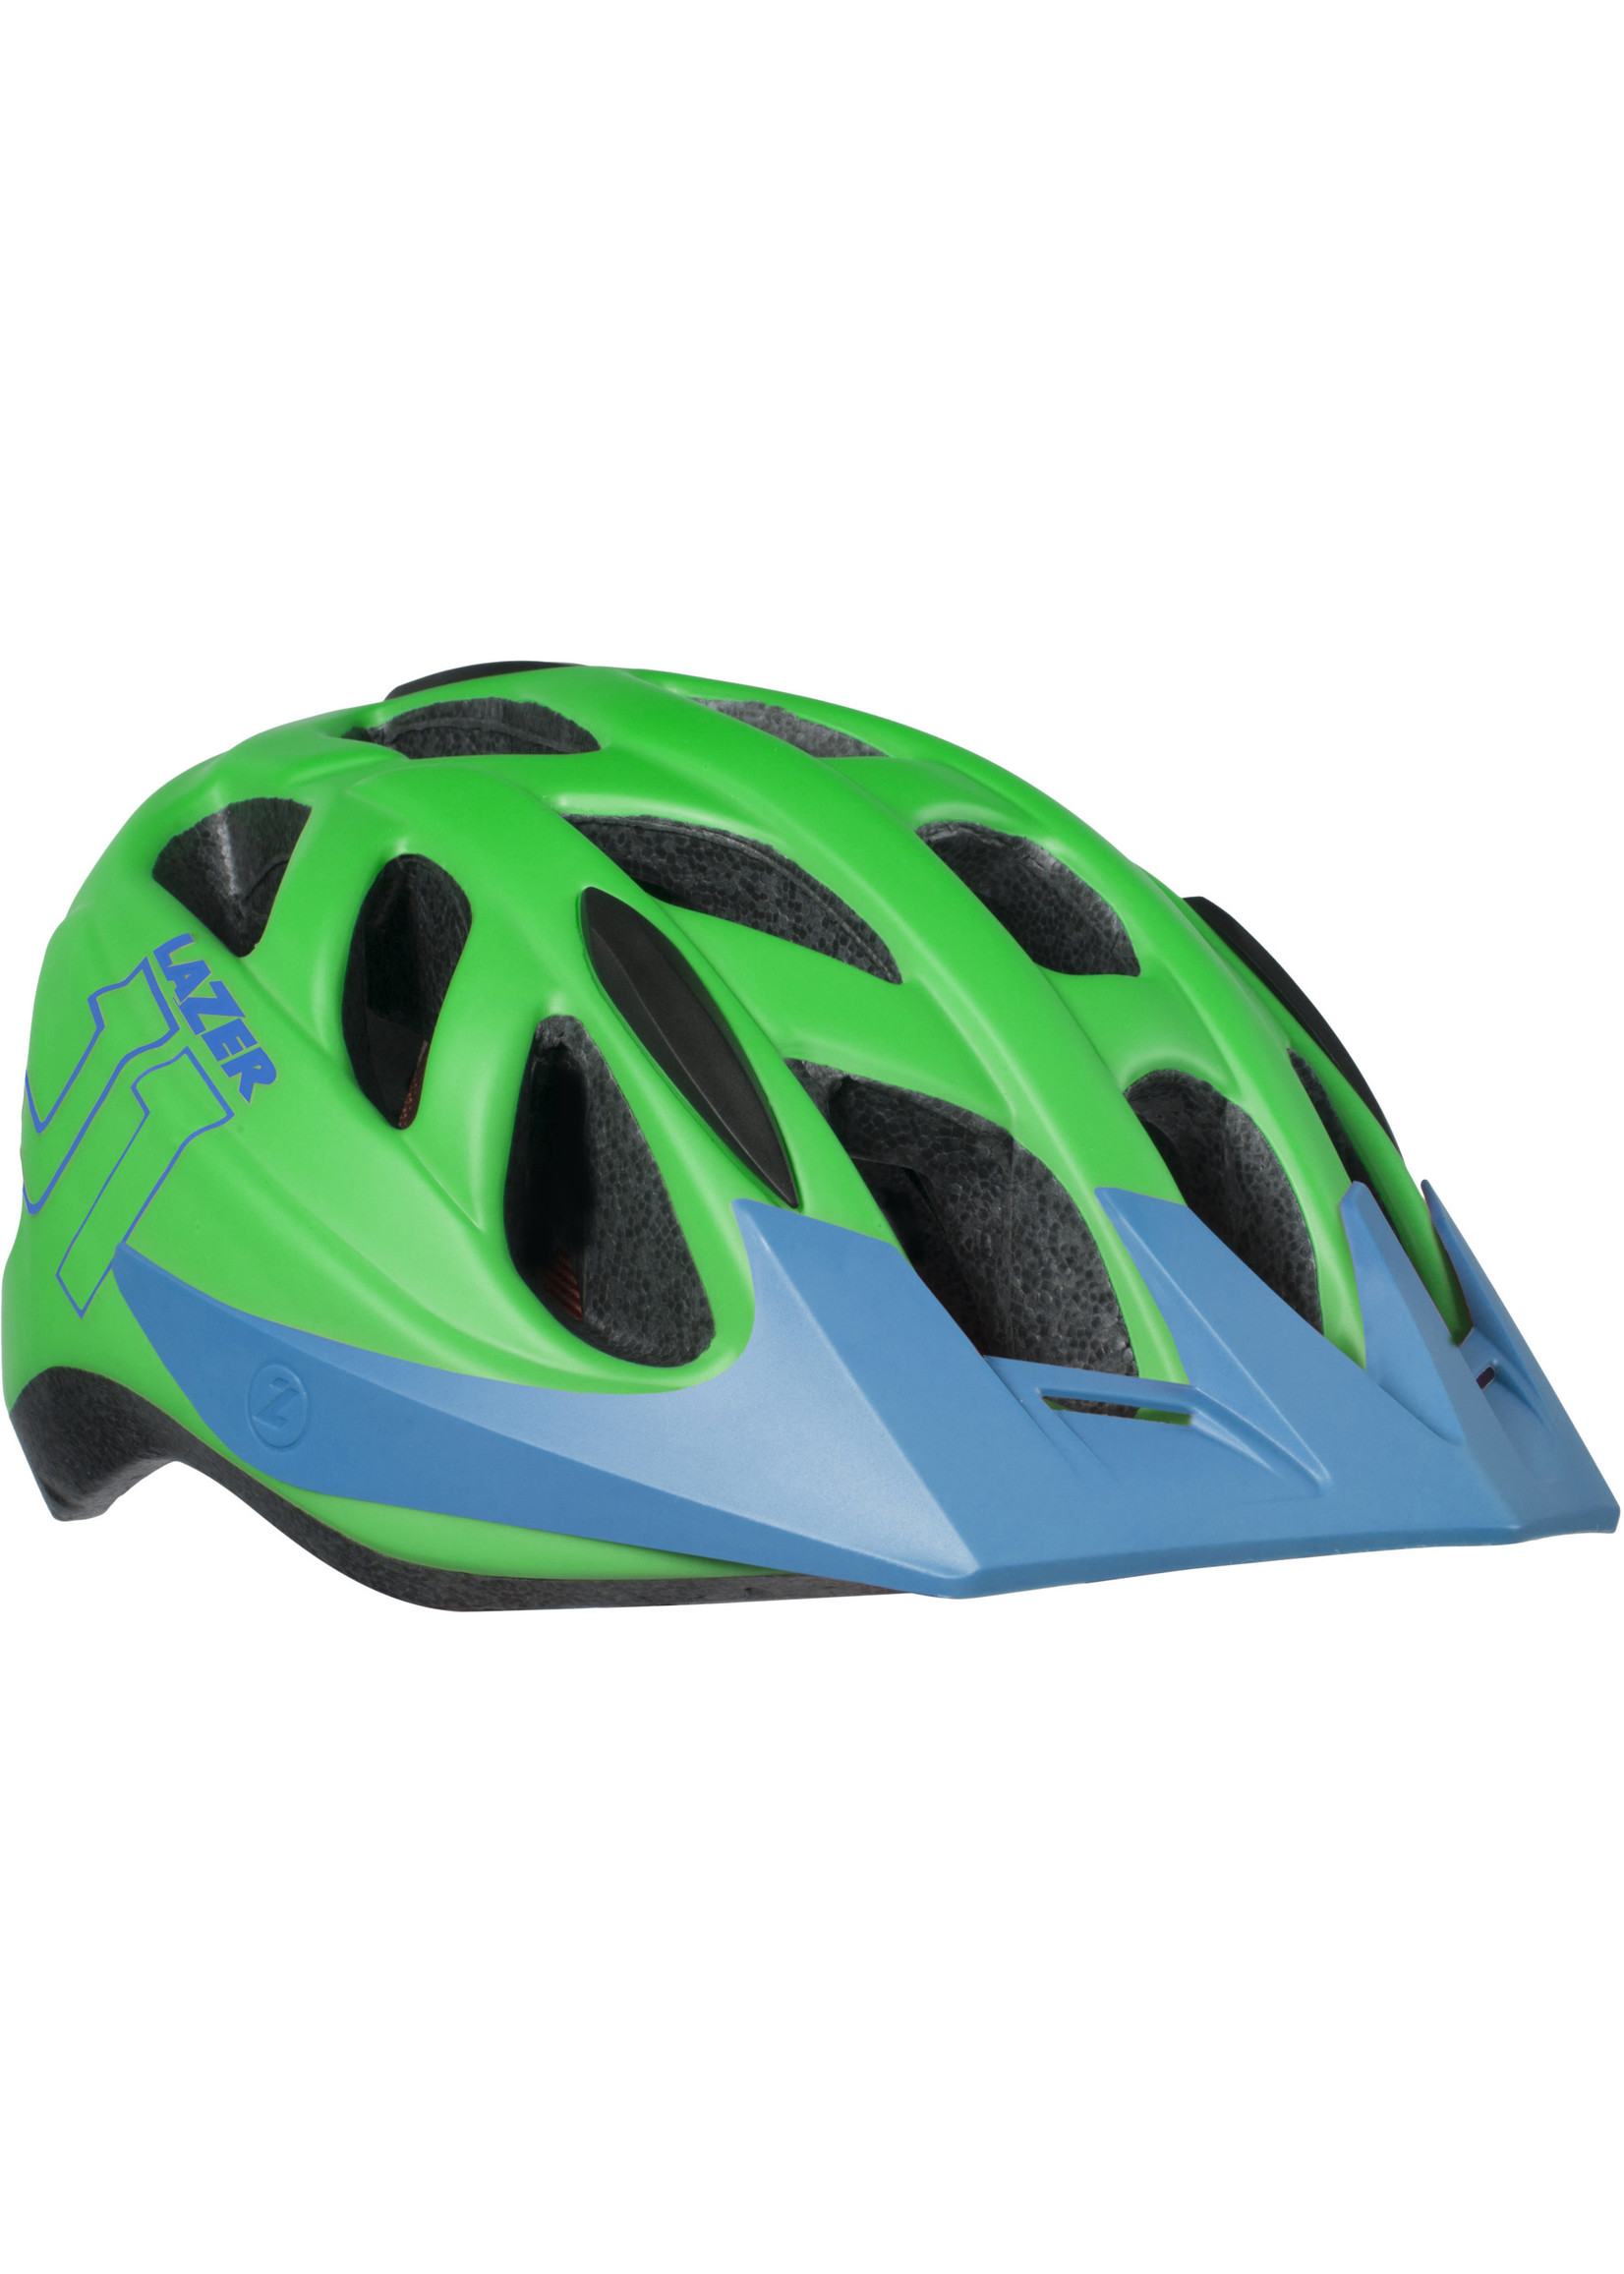 Lazer Lazer J1 Helmet, Green/Blue, Uni-Youth